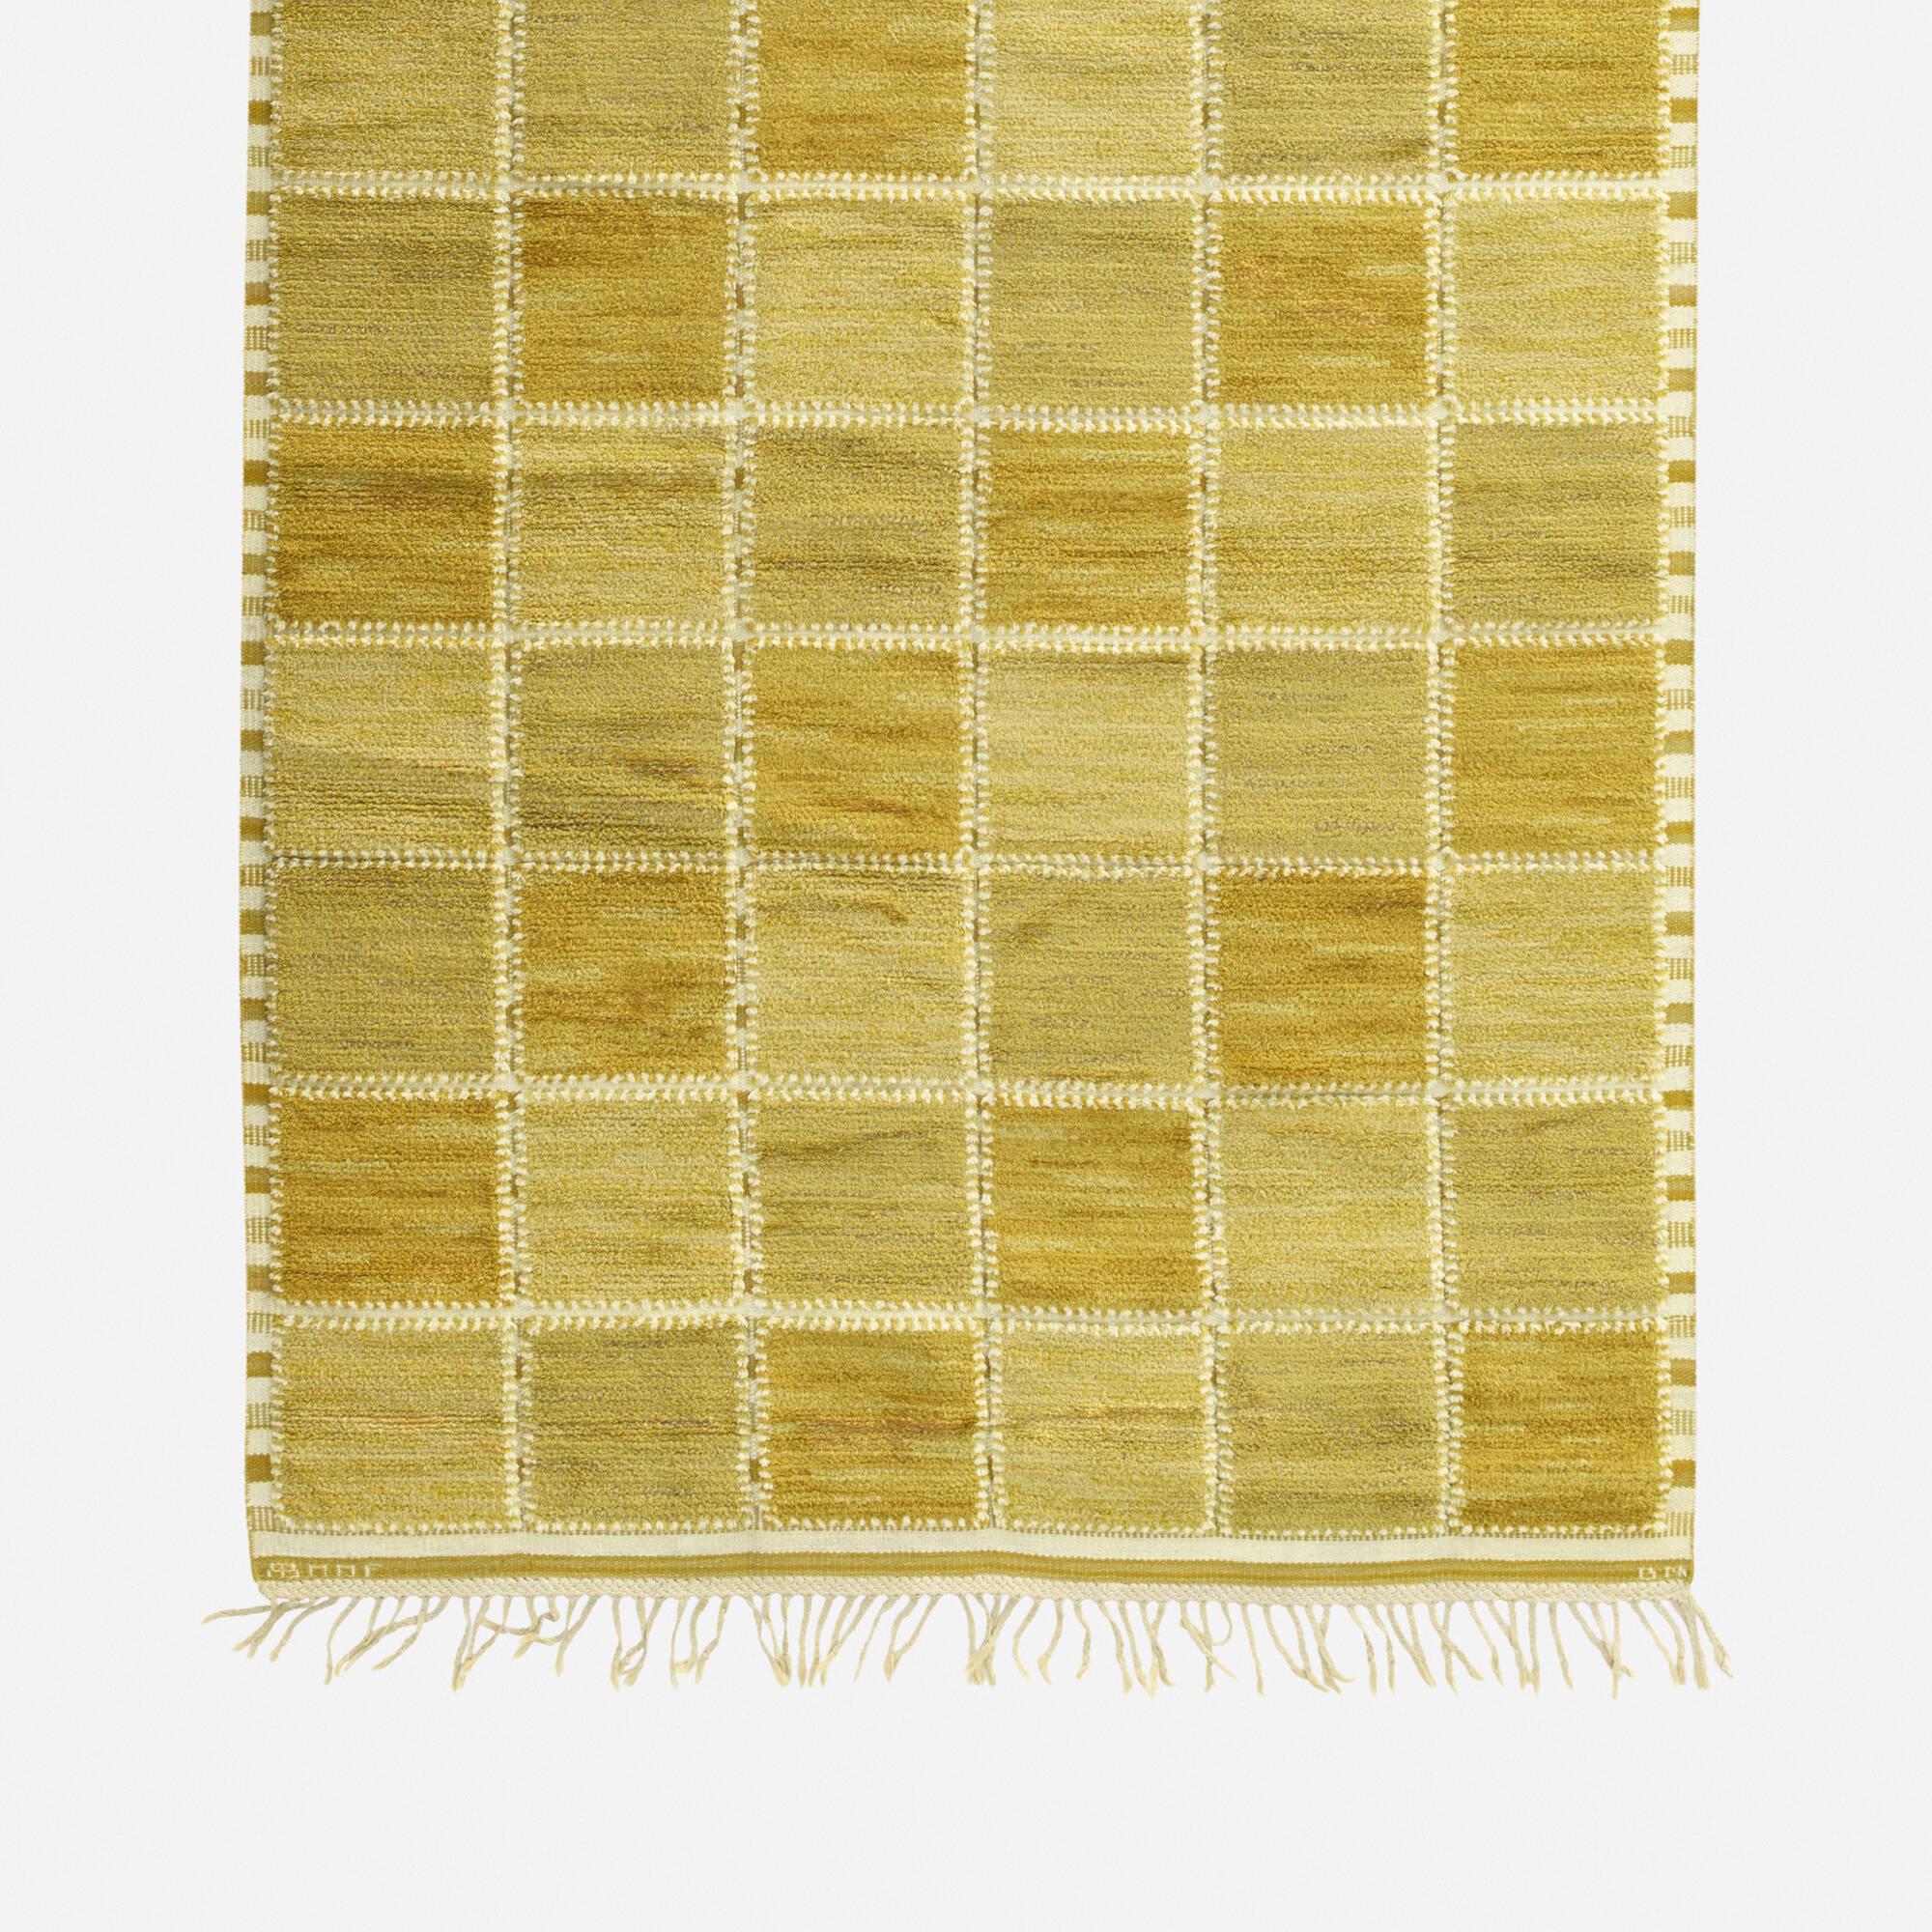 188: Barbro Nilsson / Gyllenrutan half-pile carpet (2 of 2)